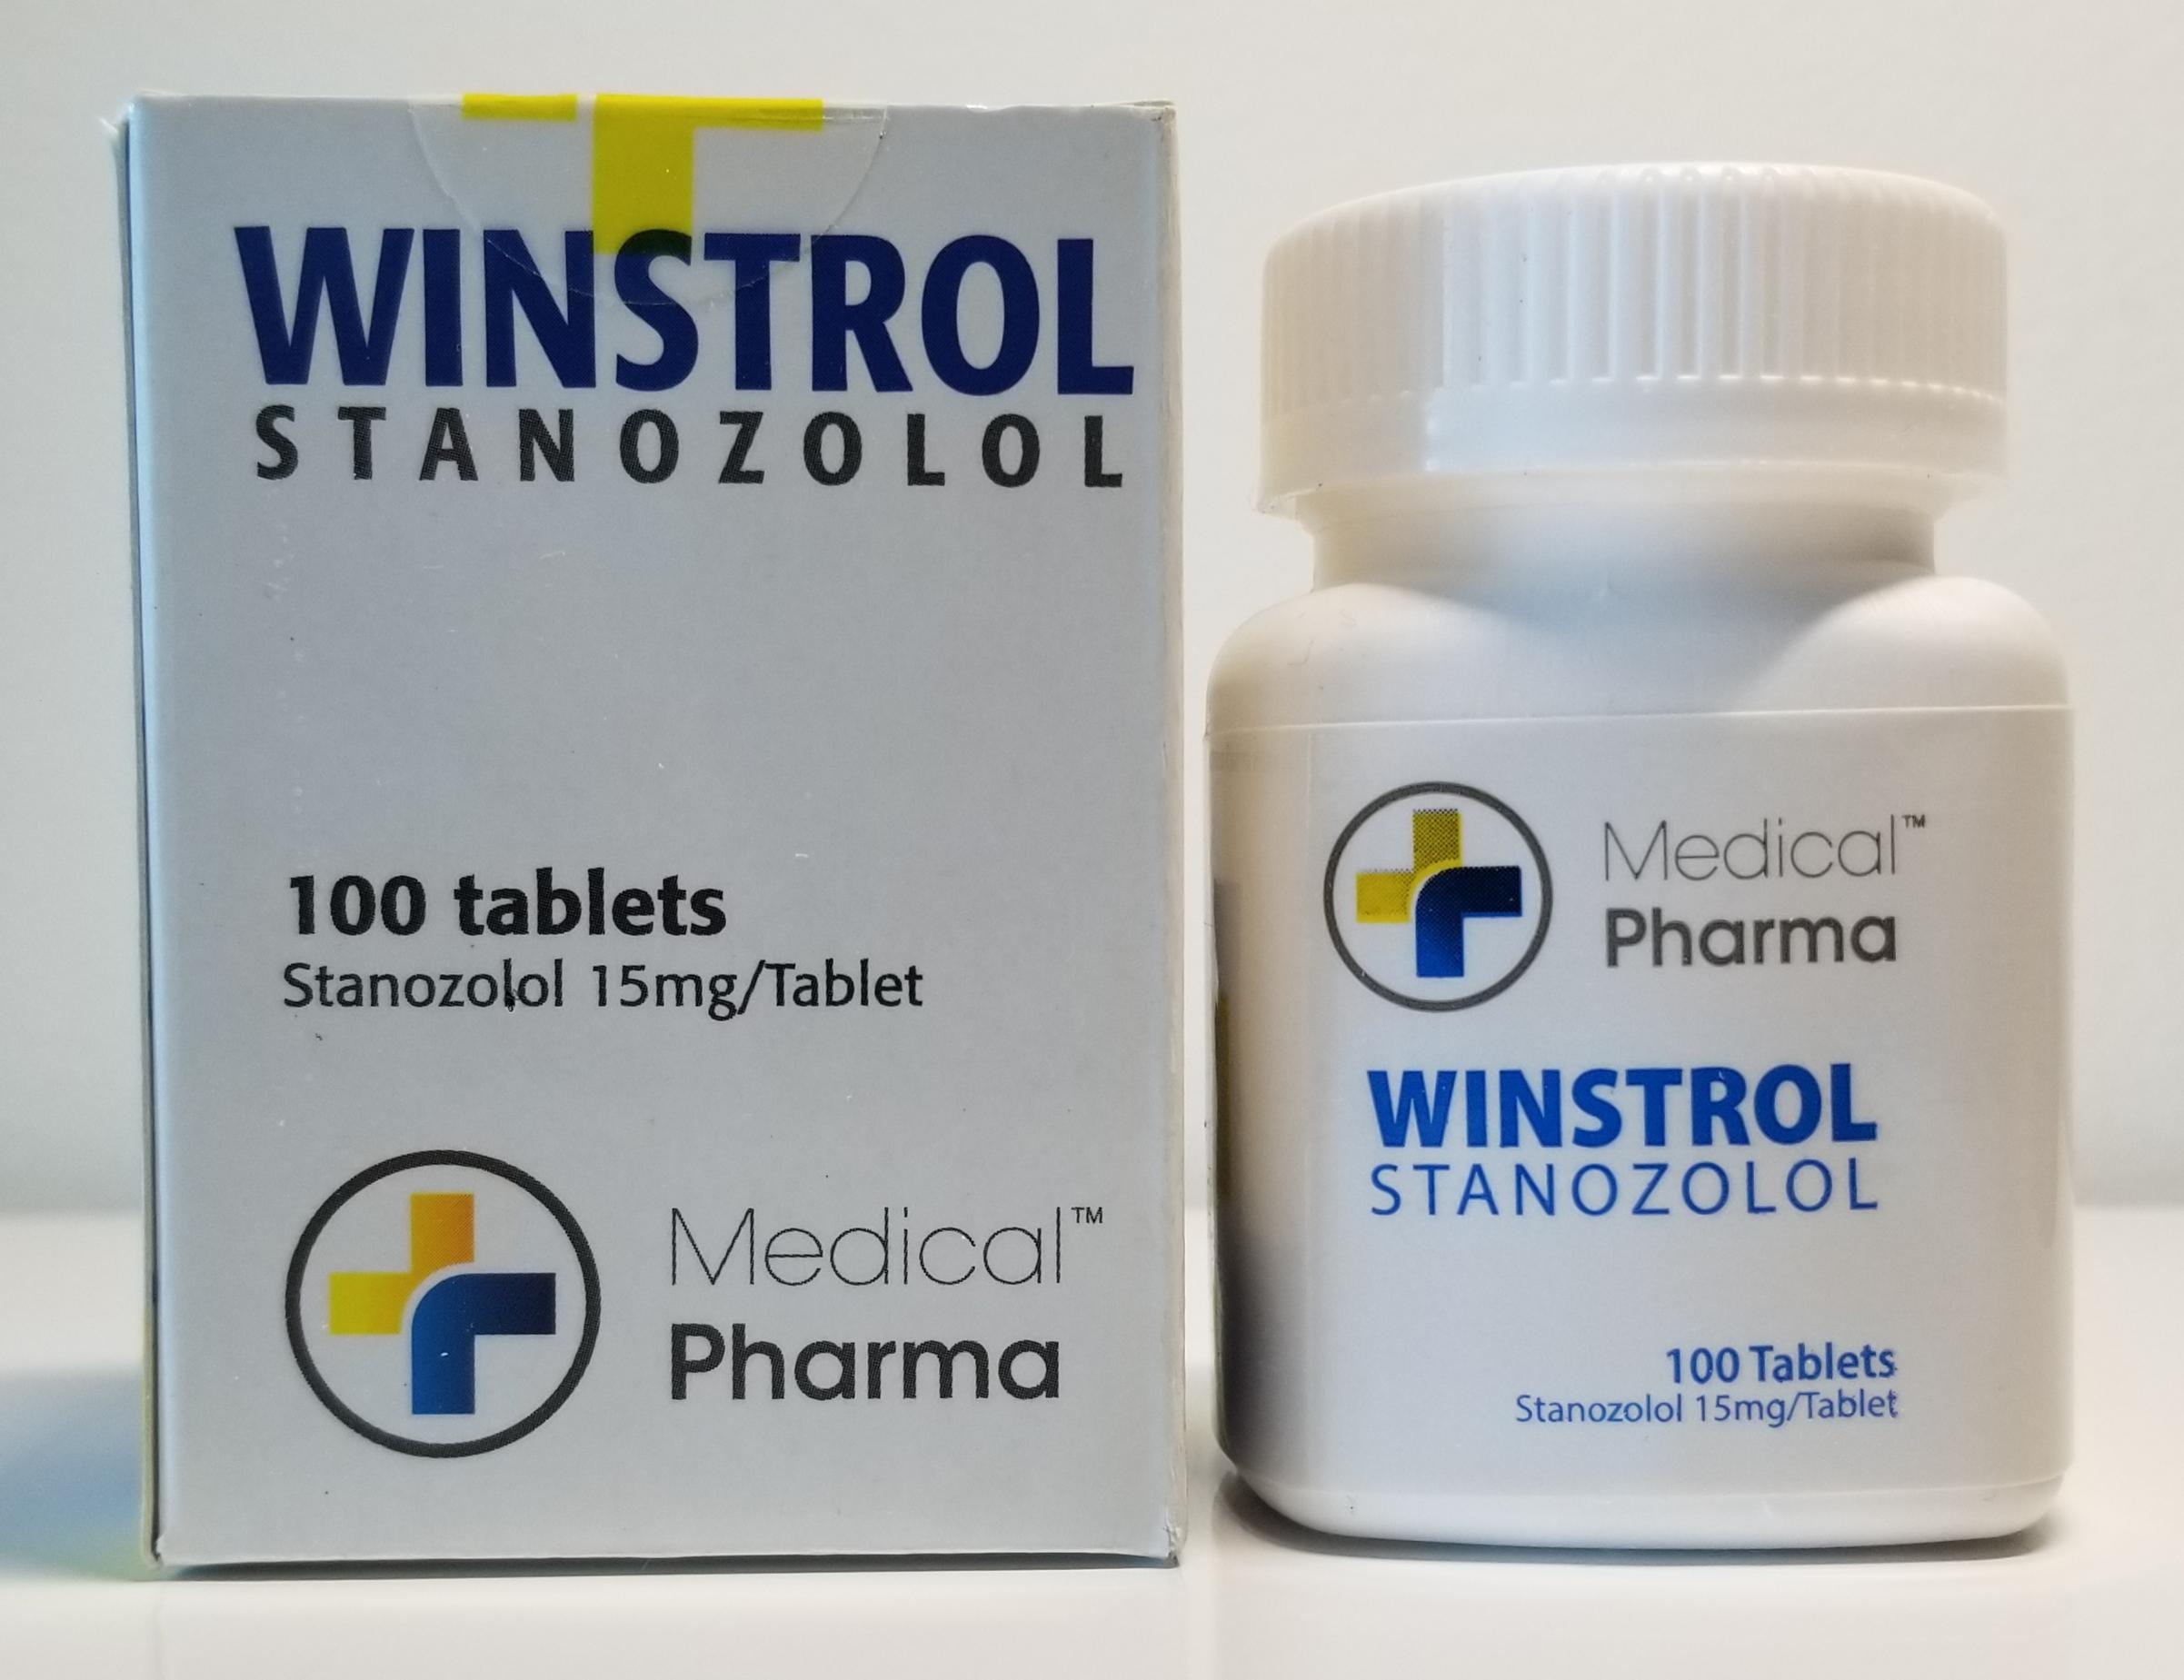 Winstrol steroid pills organon portugal contactos